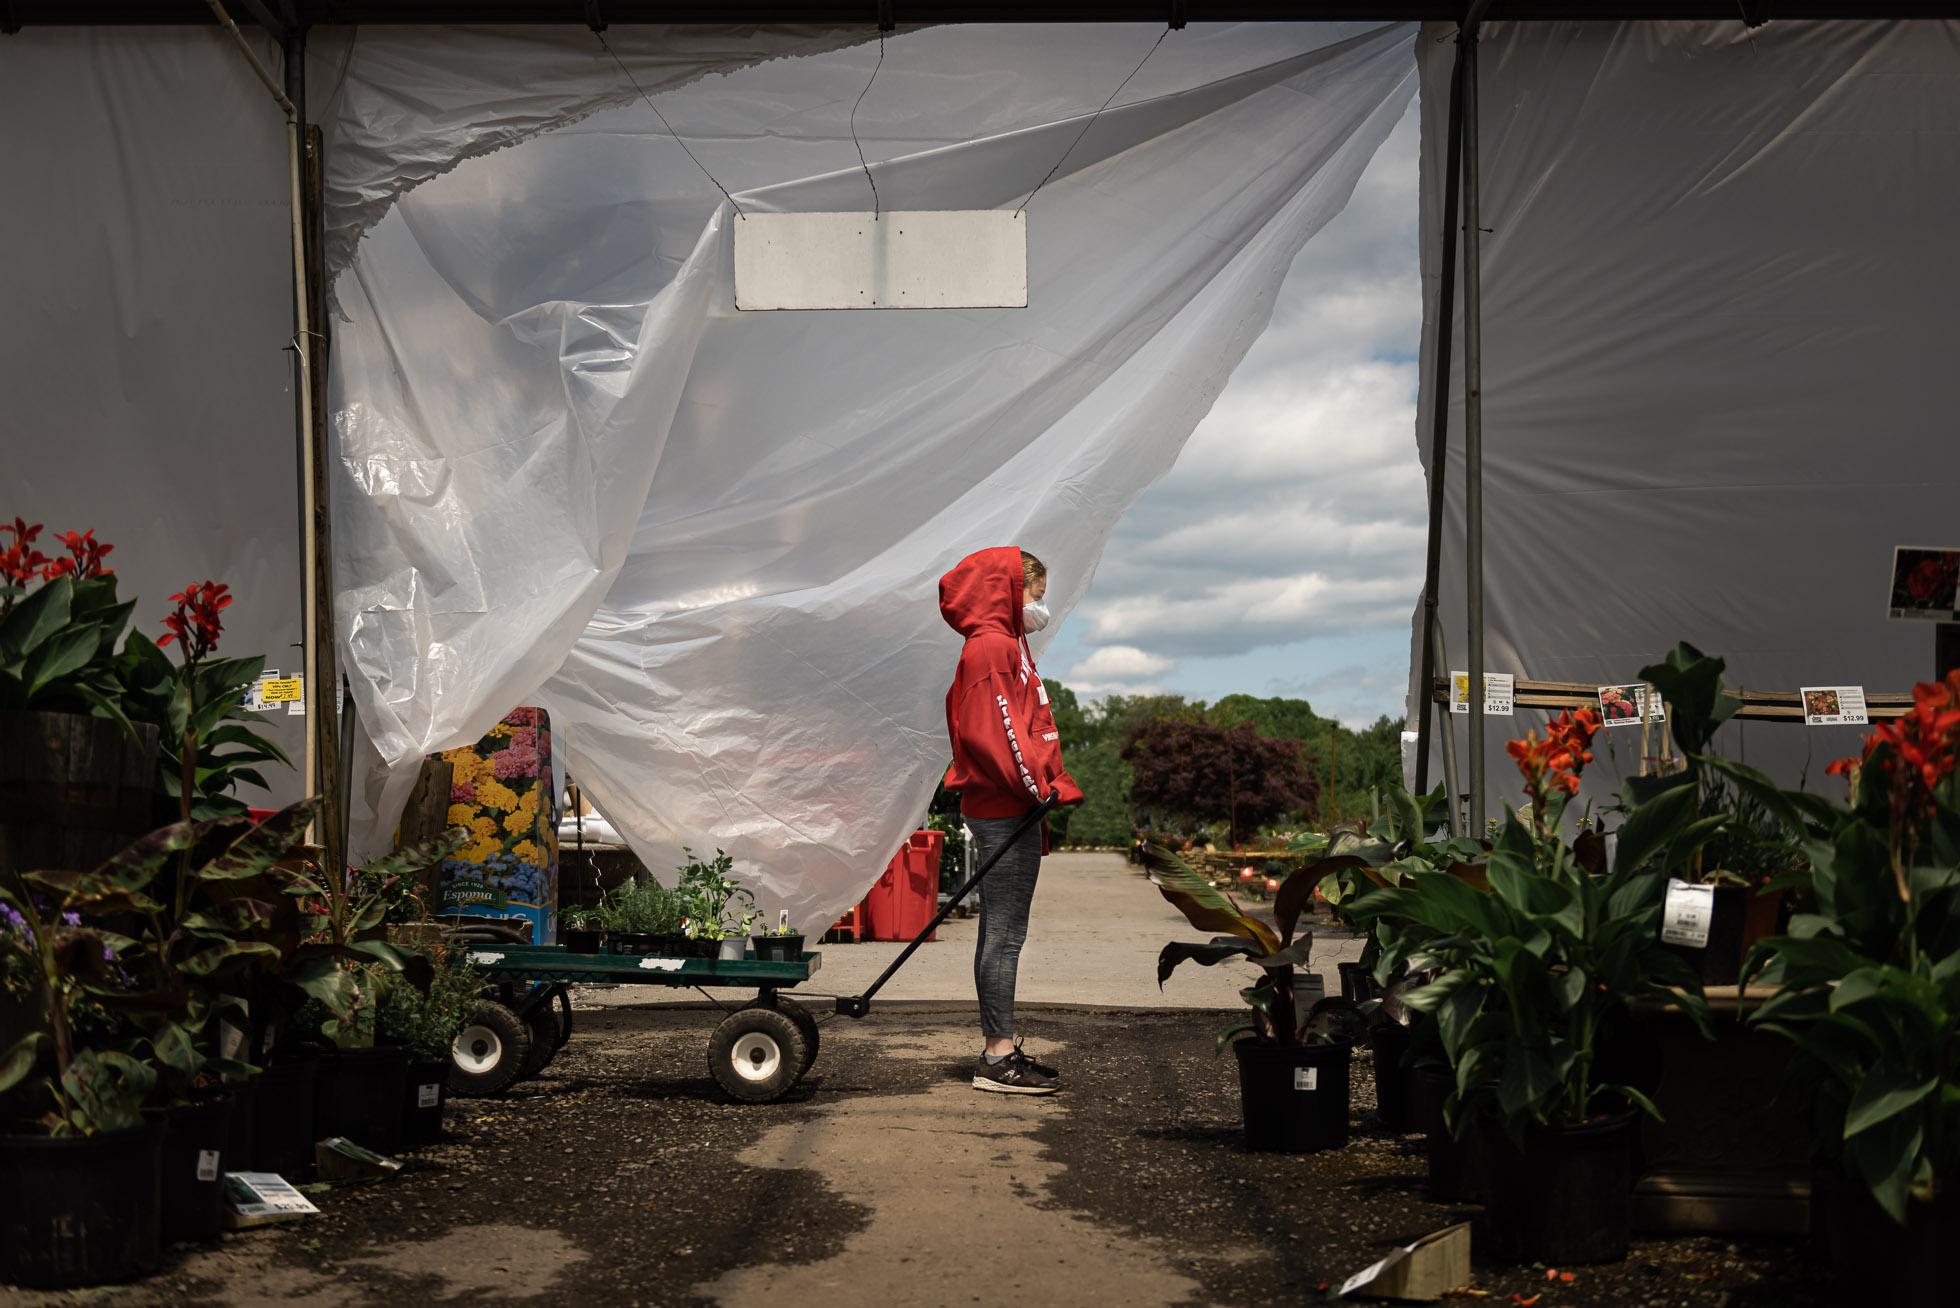 at_the_gardening_center_by_jennifer_nobriga-